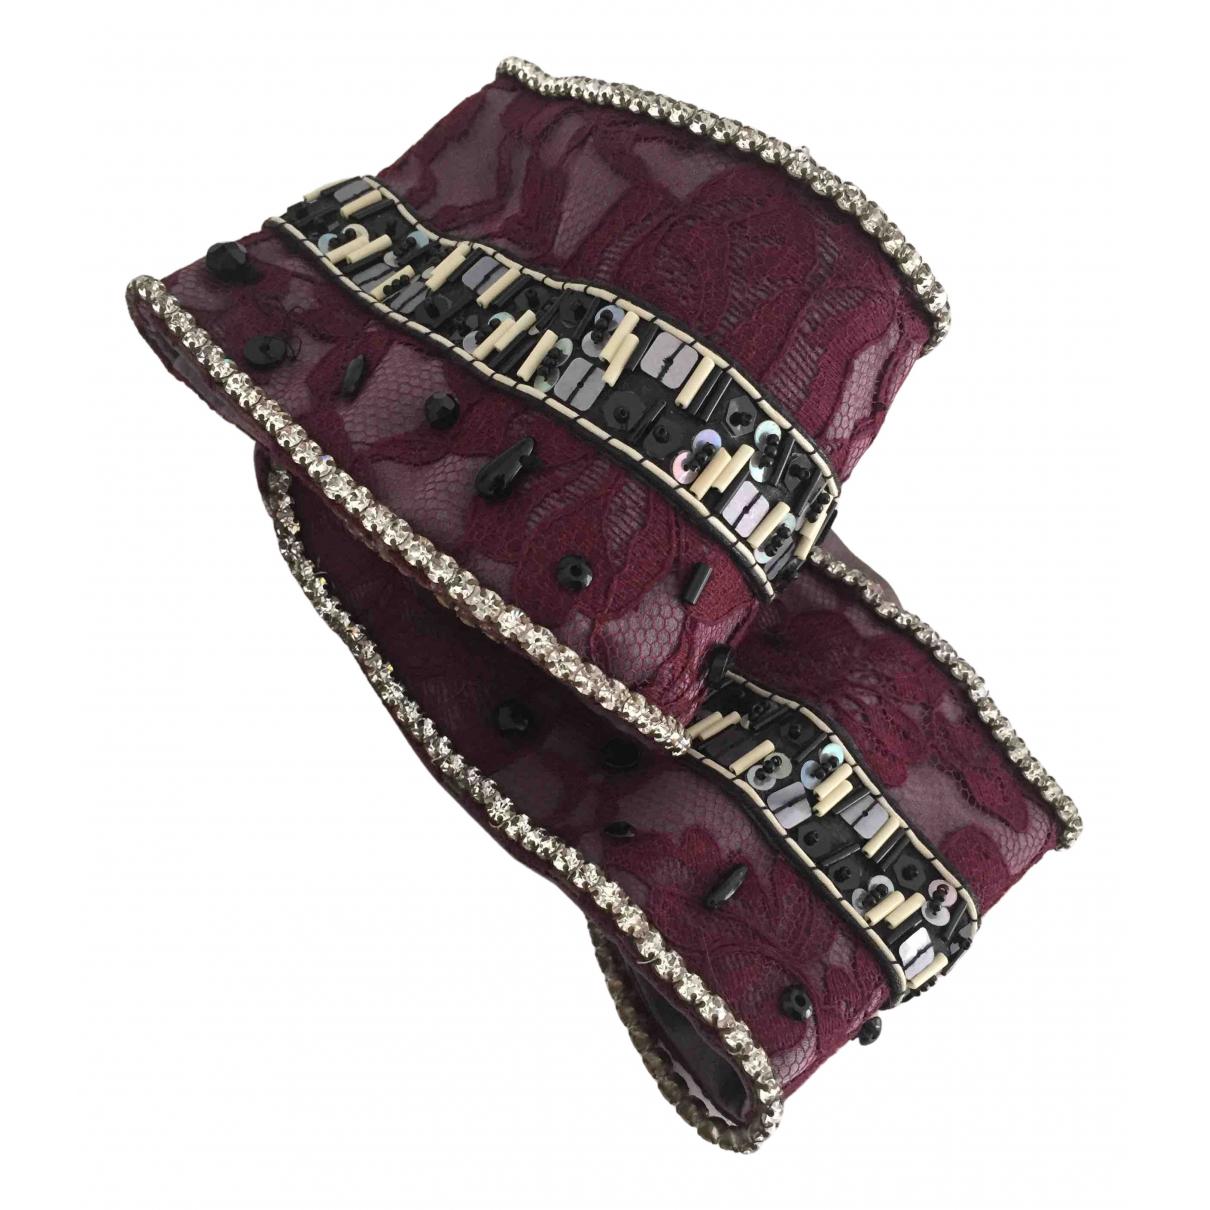 Dolce & Gabbana \N Burgundy Silk belt for Women 31 Inches